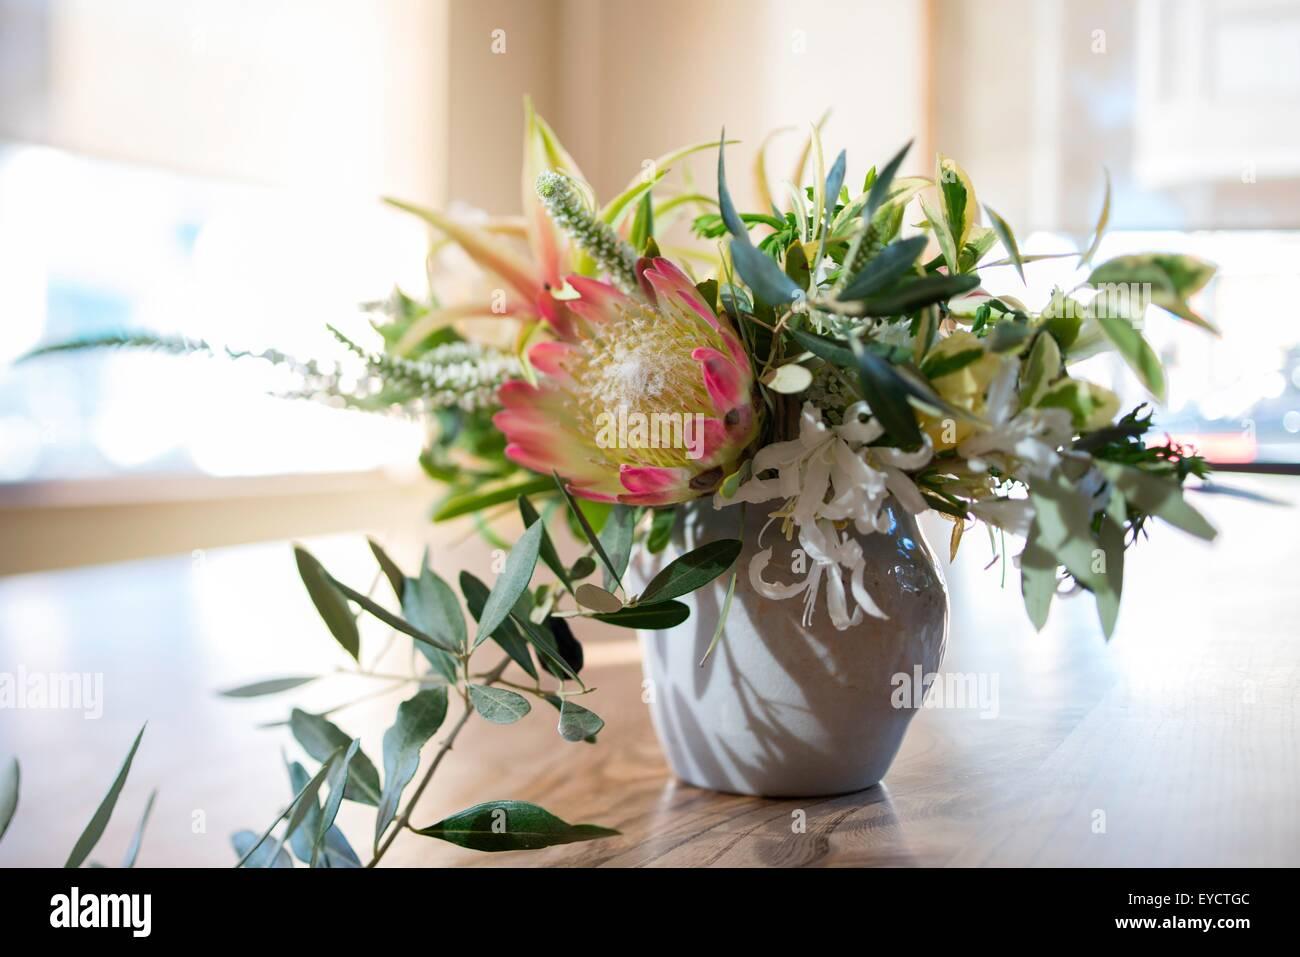 Arreglo de flores con follaje en mesa de comedor Imagen De Stock